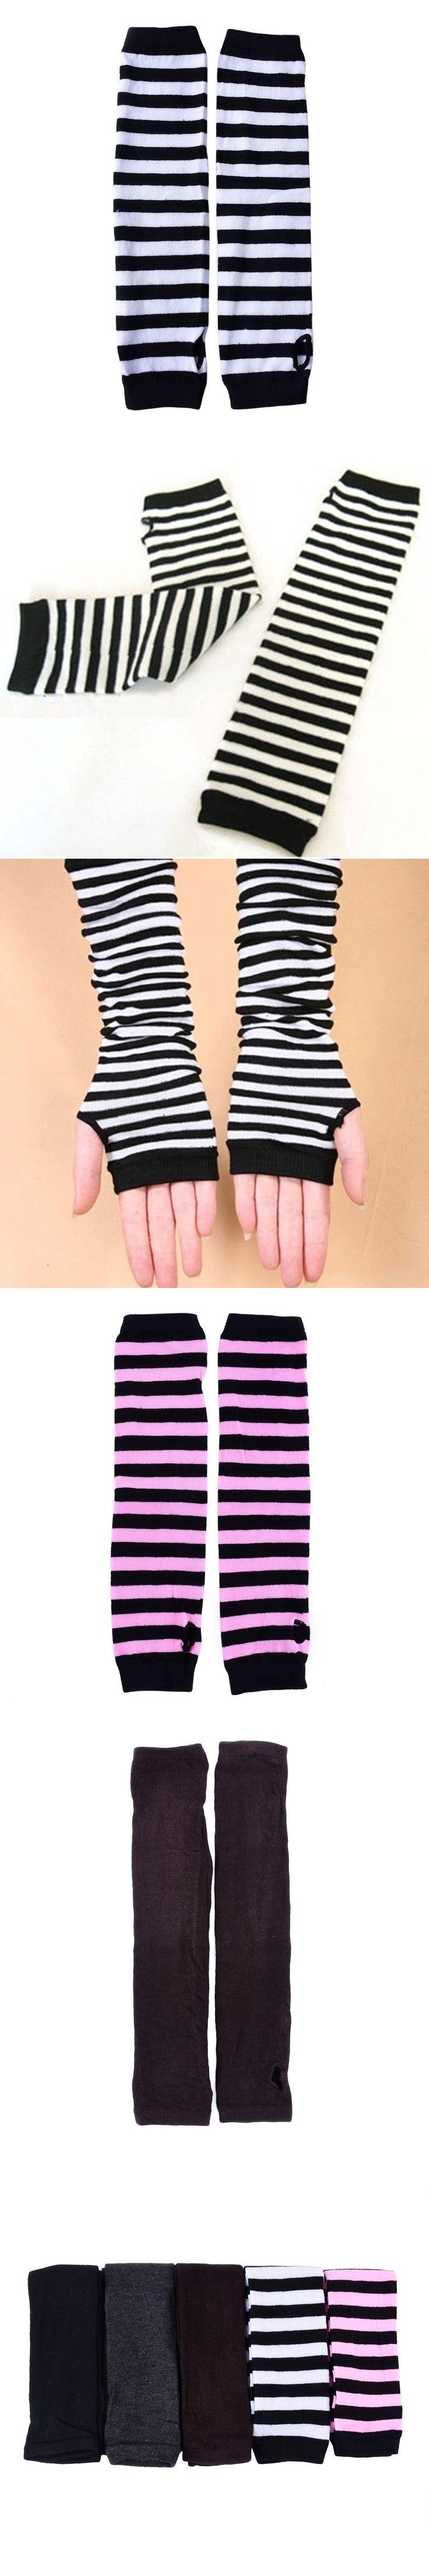 Women Knit Long Arm Warmers Sleeves Winter Fingerless Gloves Striped Gloves New Sale